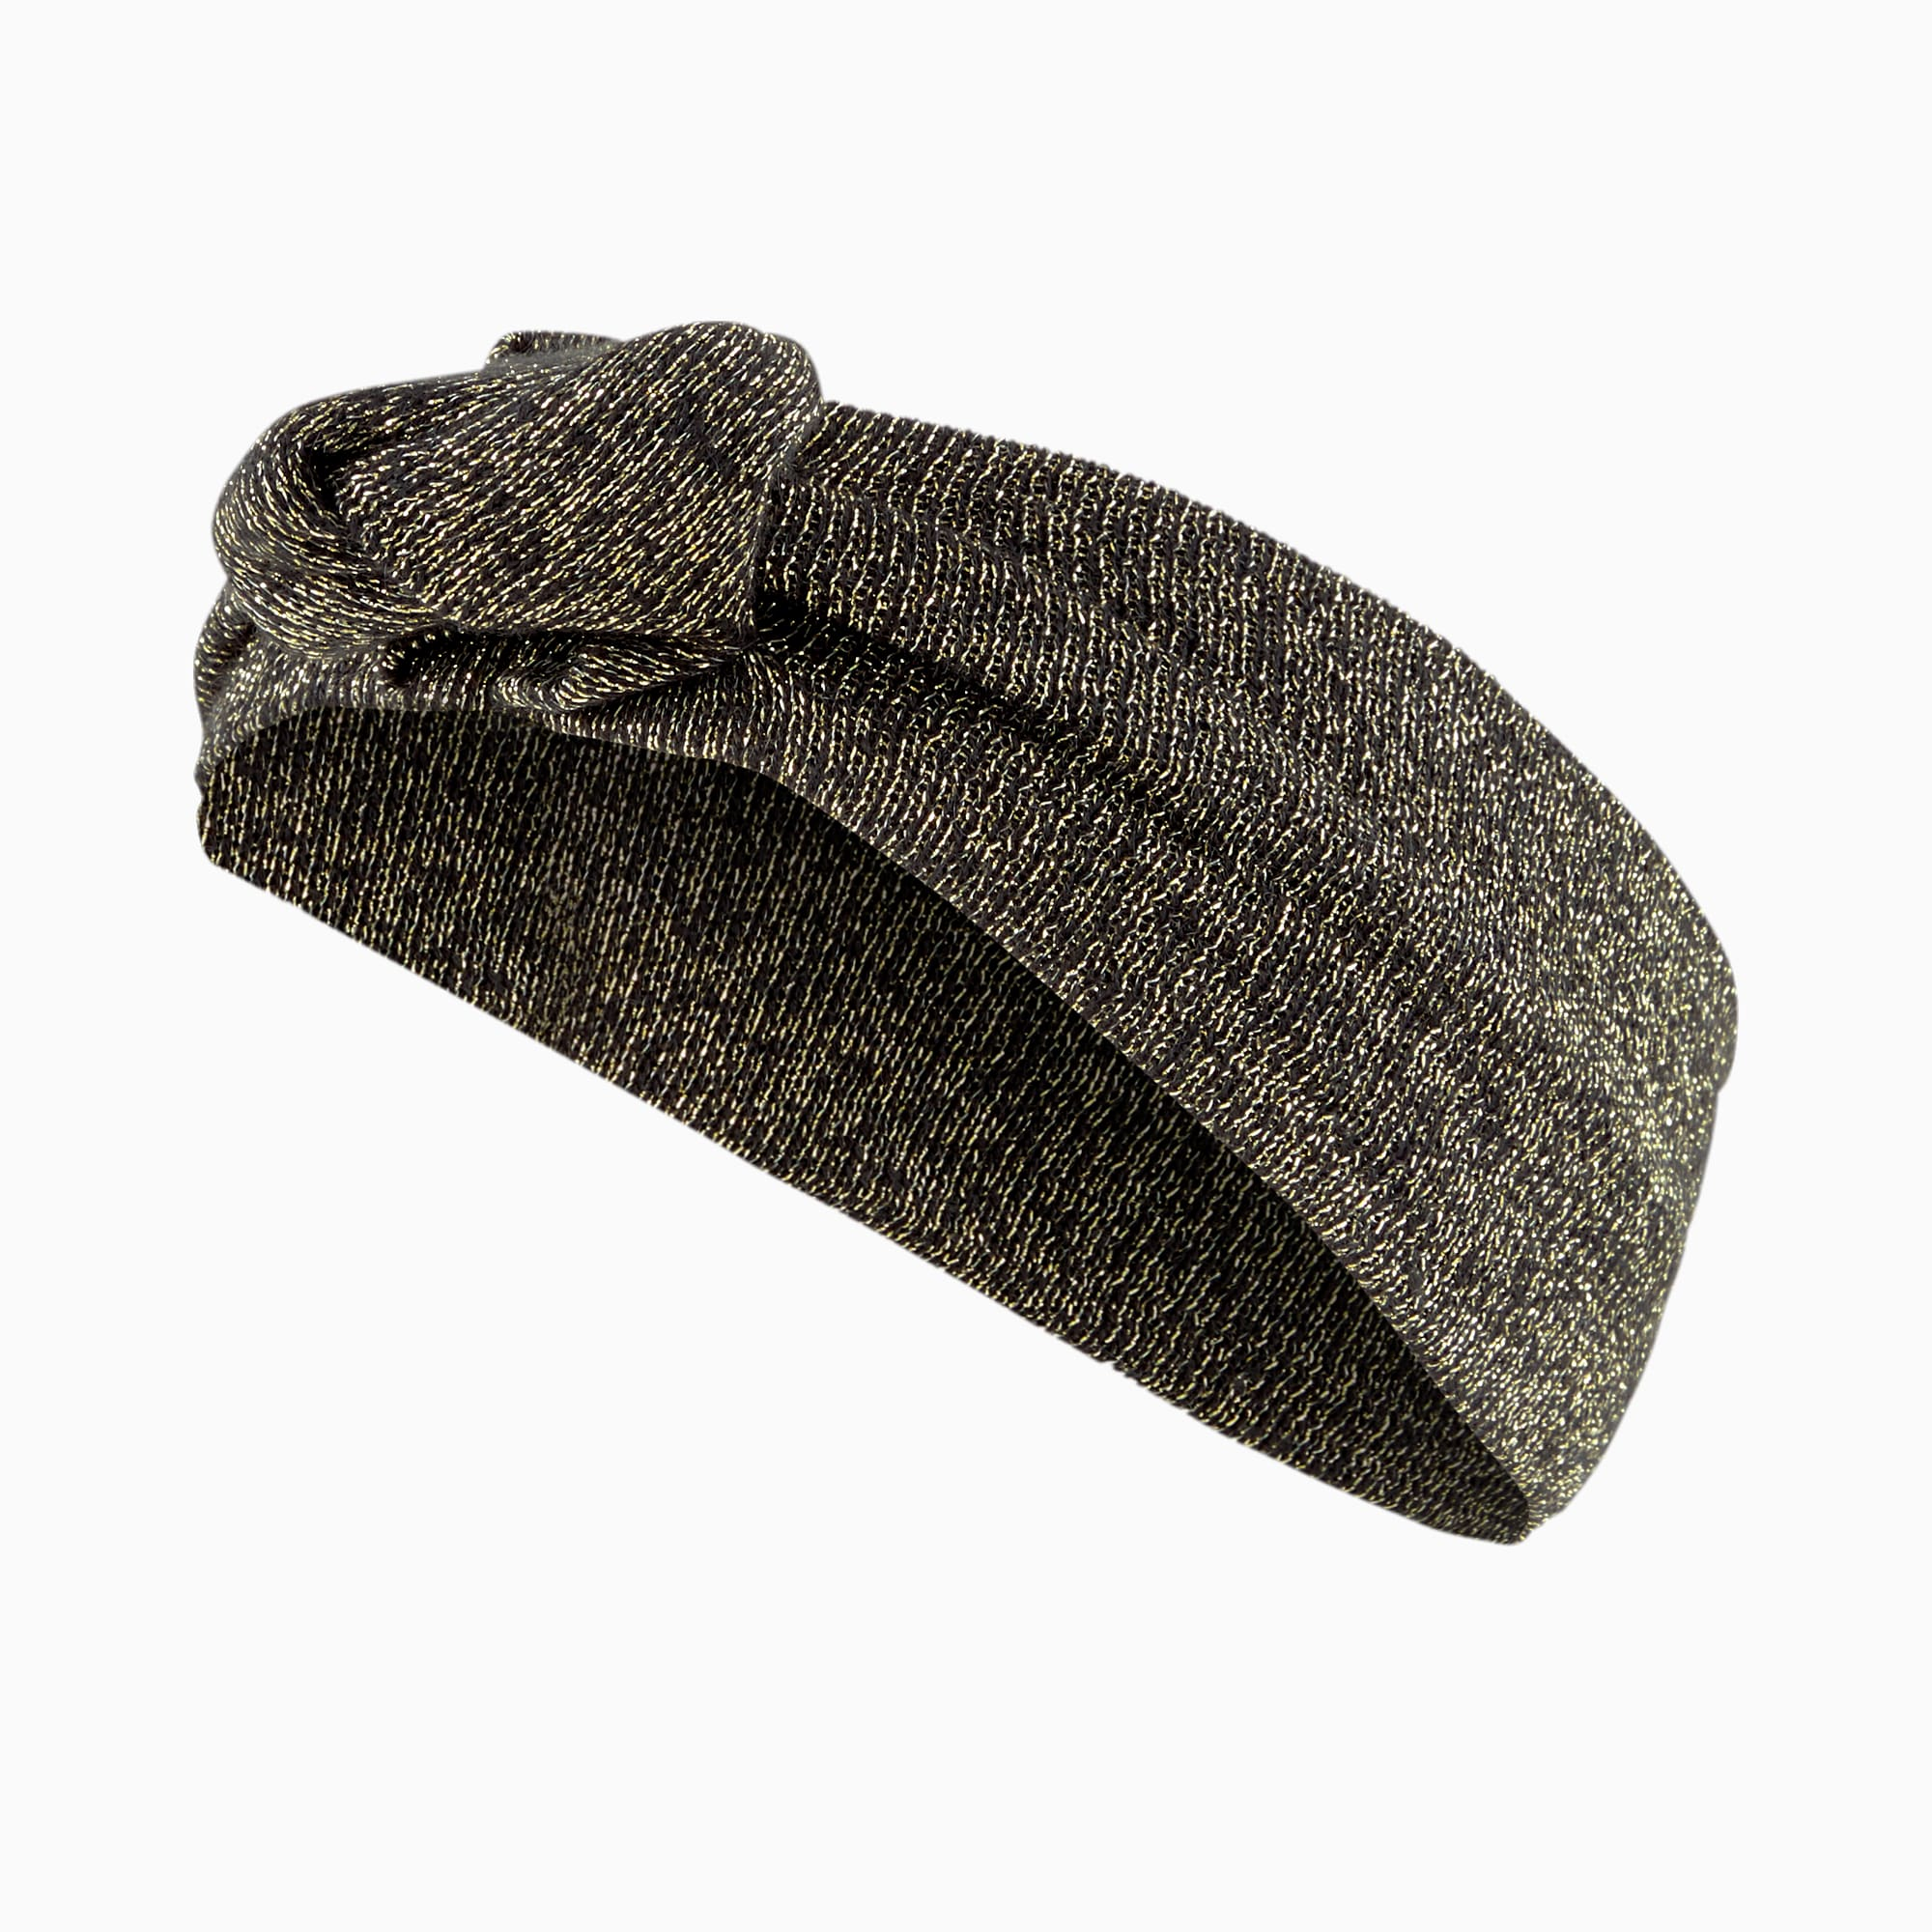 PUMA x CHARLOTTE OLYMPIA Women's Headband